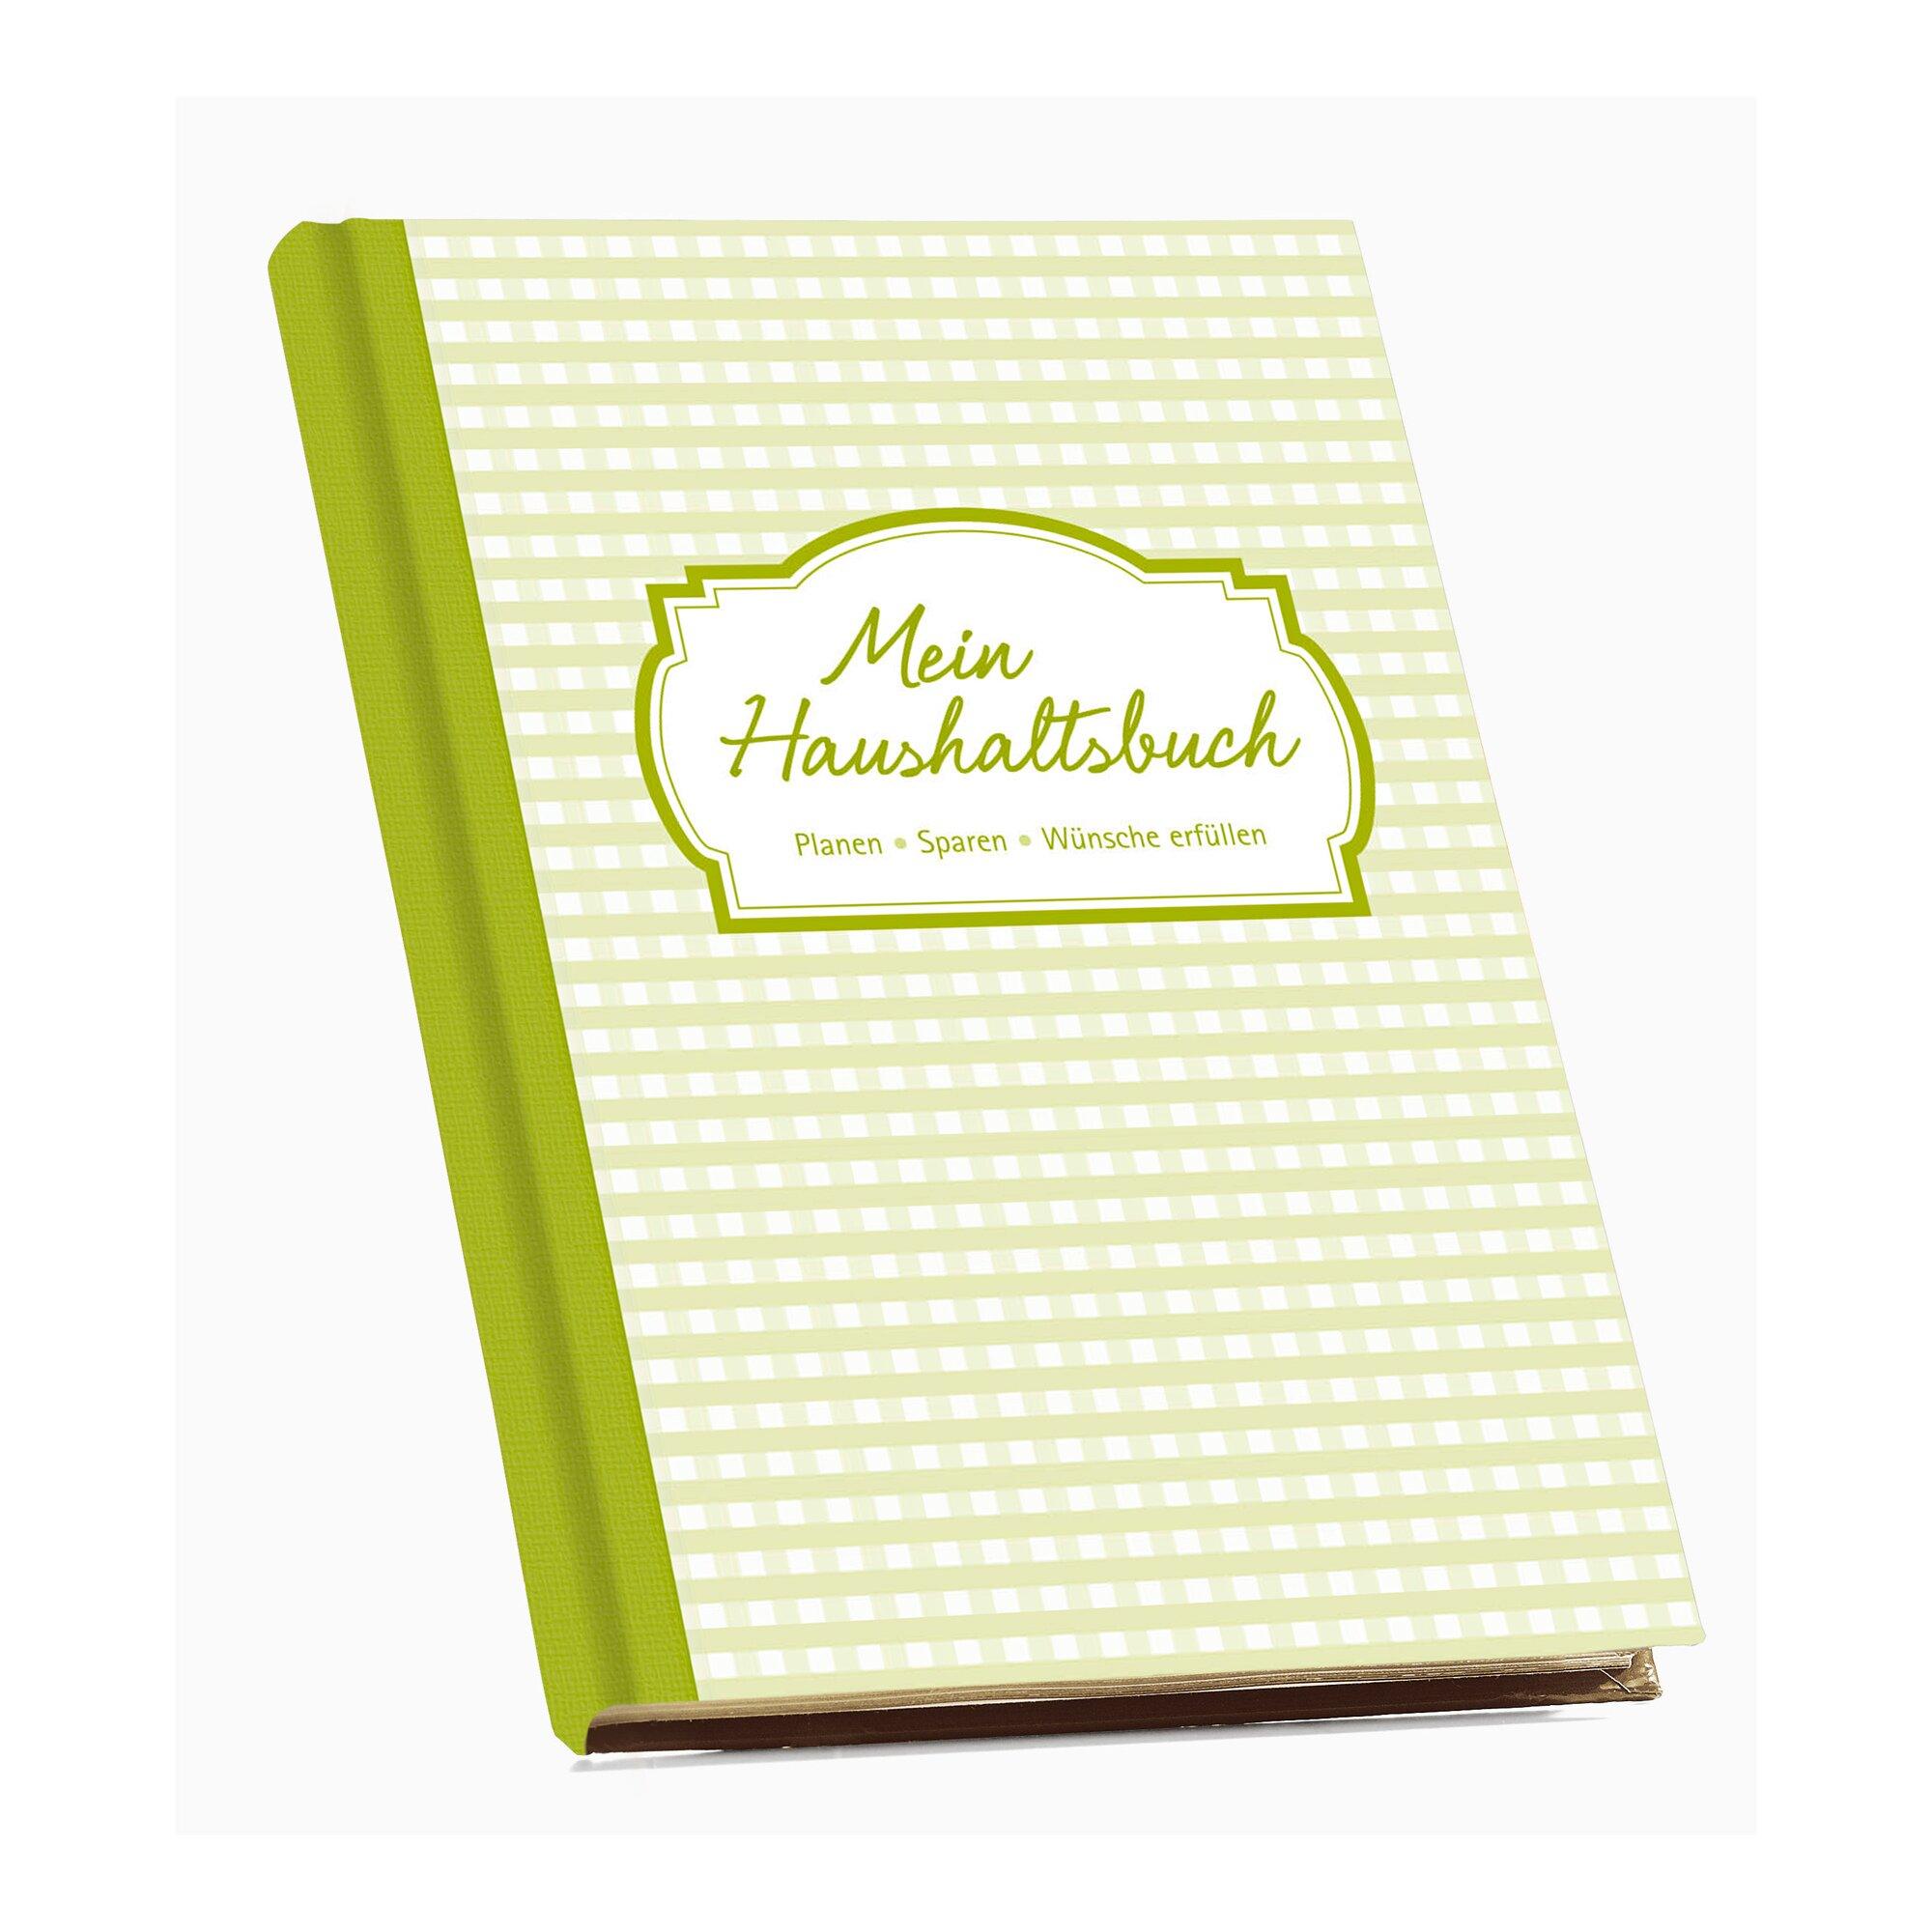 Image of Mein Haushaltsbuch